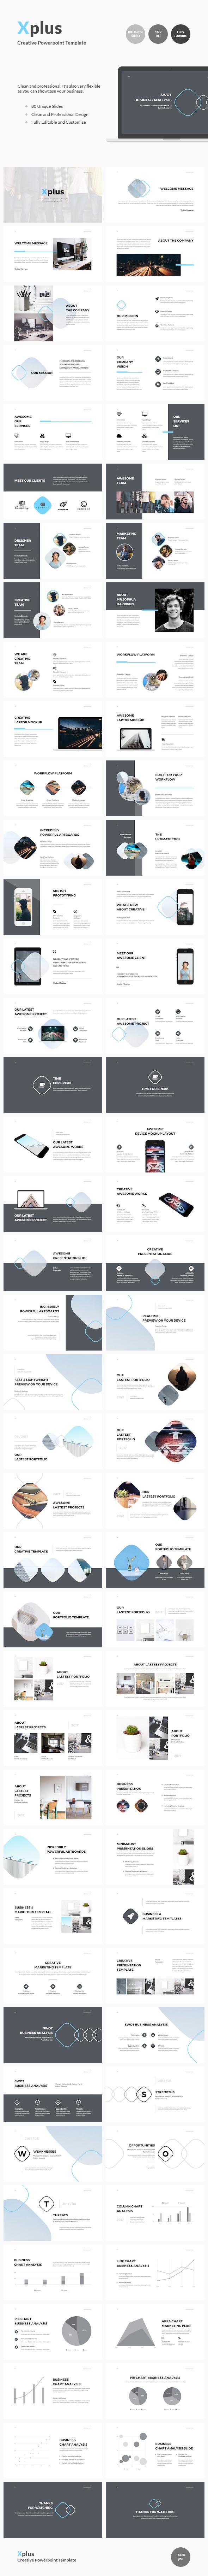 Xplus - Creative Powerpoint Template - Business PowerPoint Templates